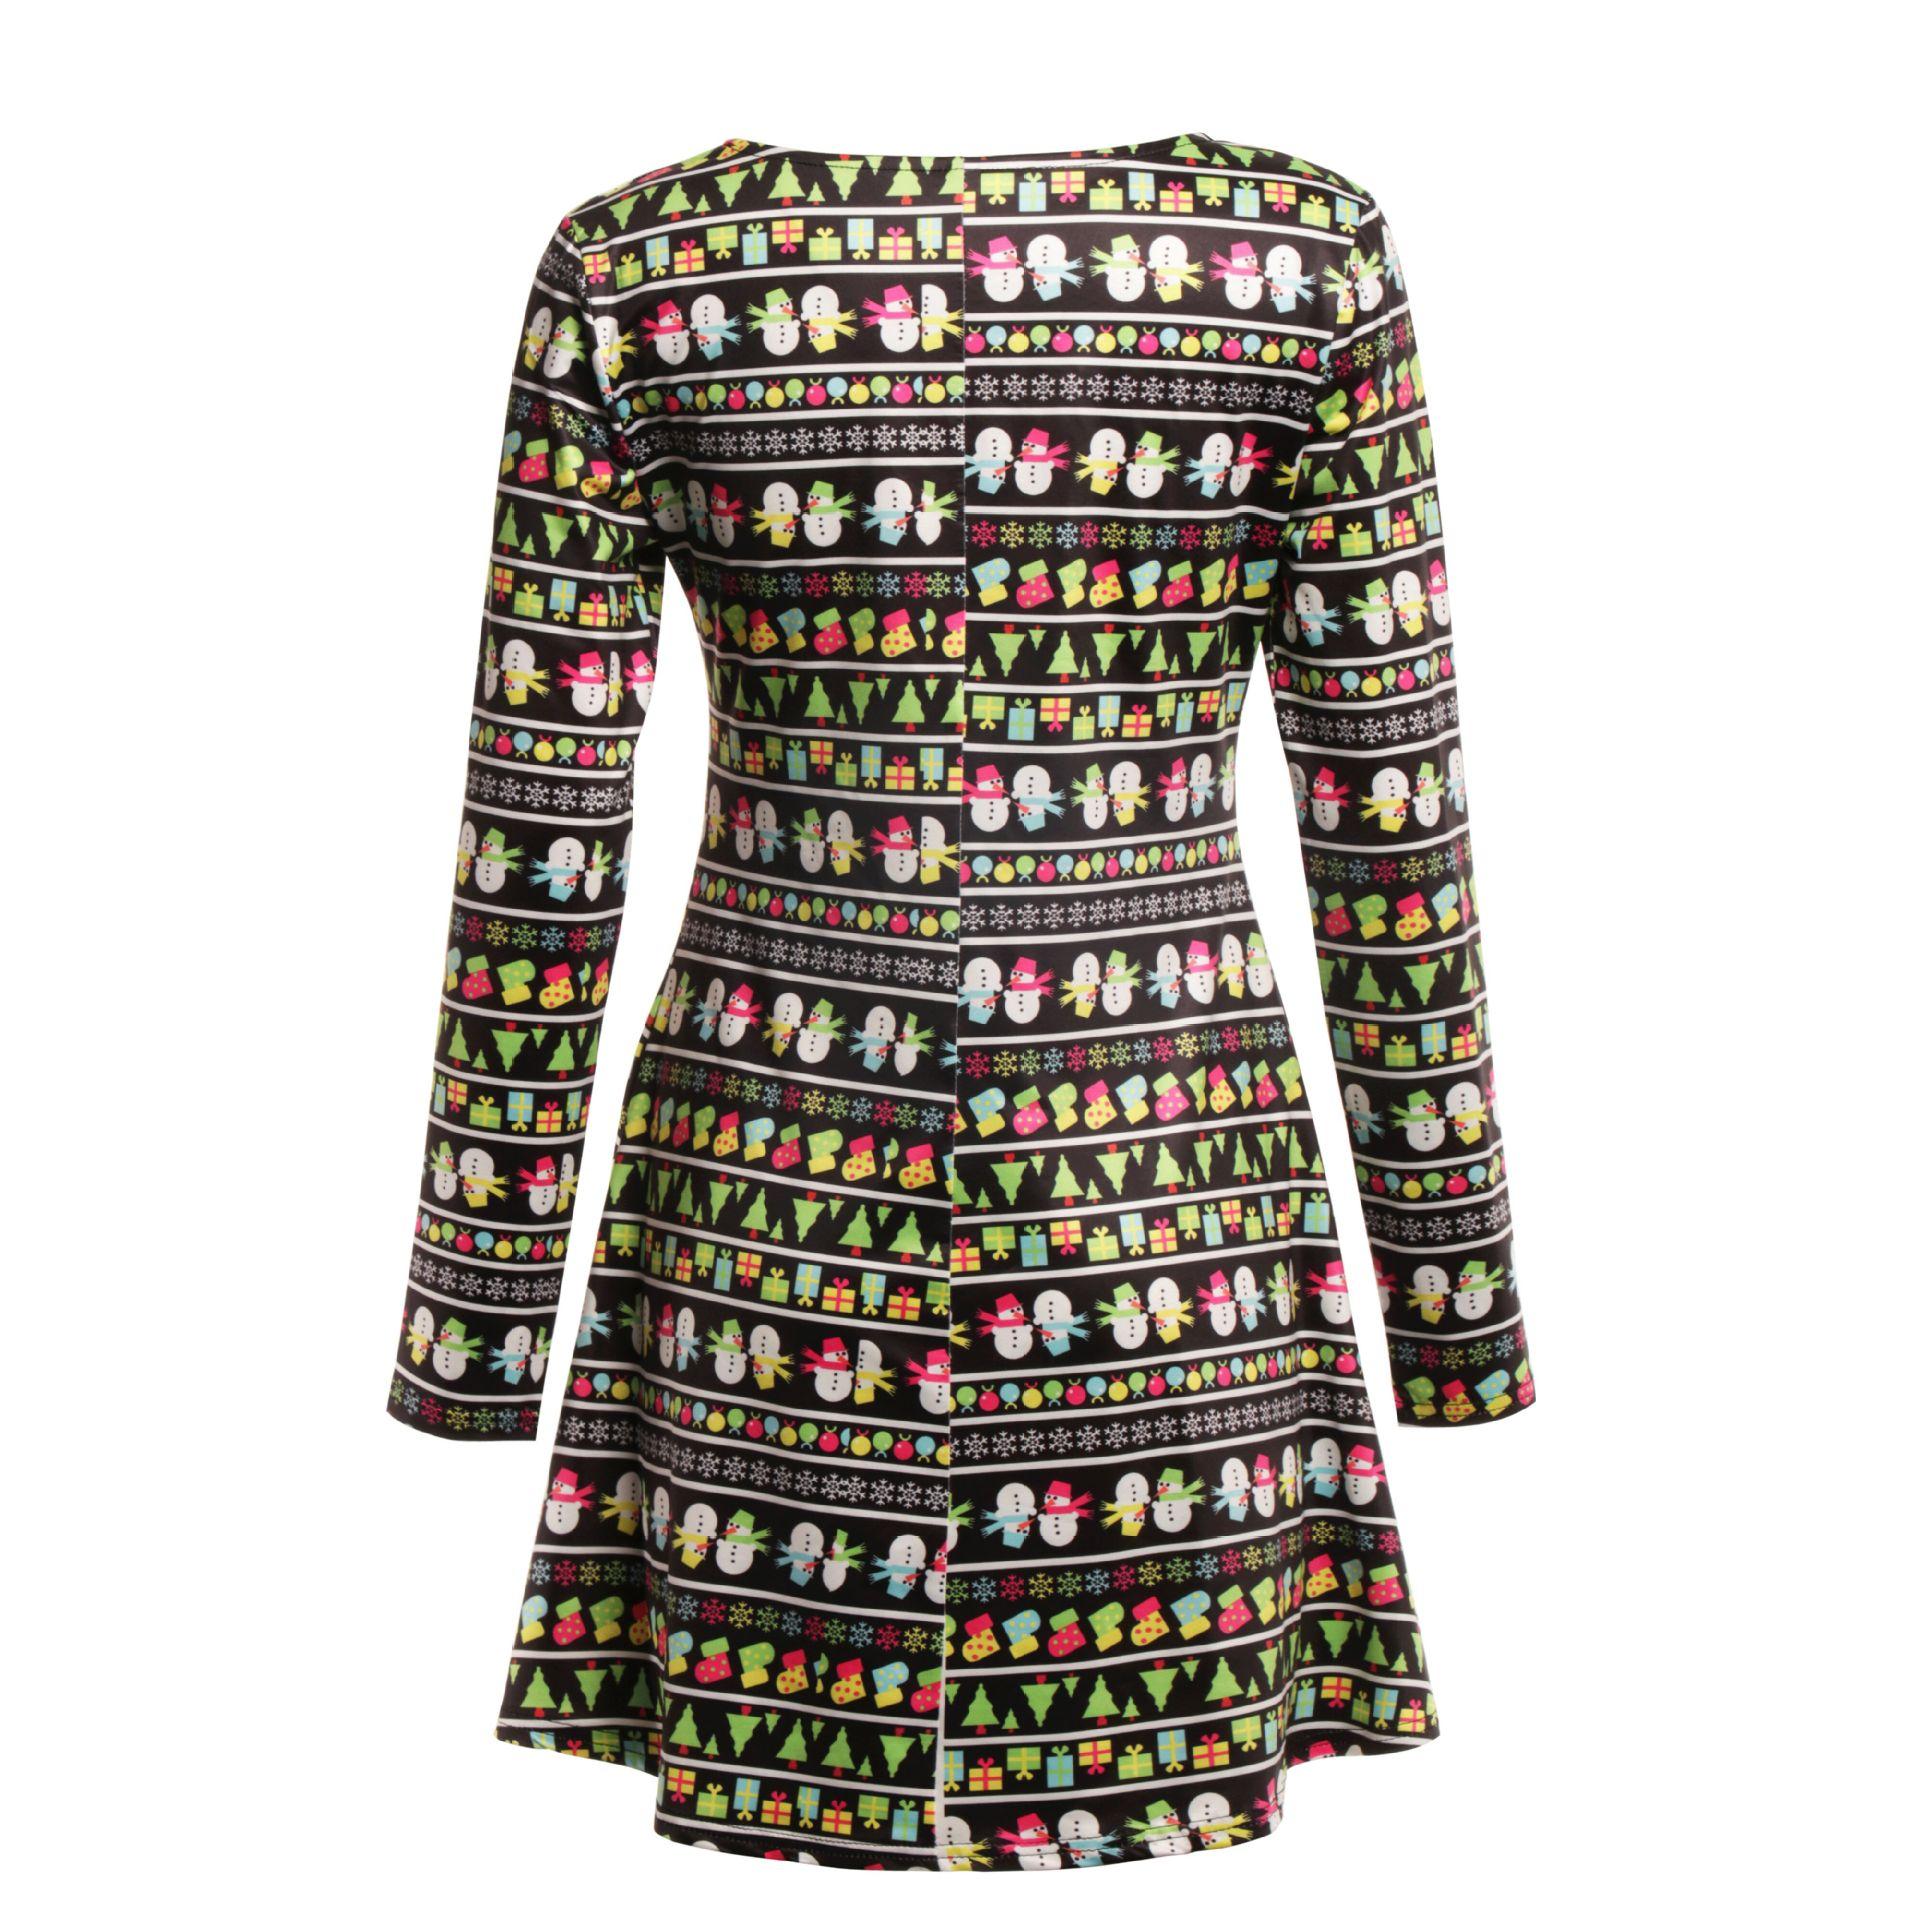 Print Long Sleeve Autumn Winter Christmas Dress Women 19 Casual Loose Short Party Dress Plus Size S-5XL Vestidos 6